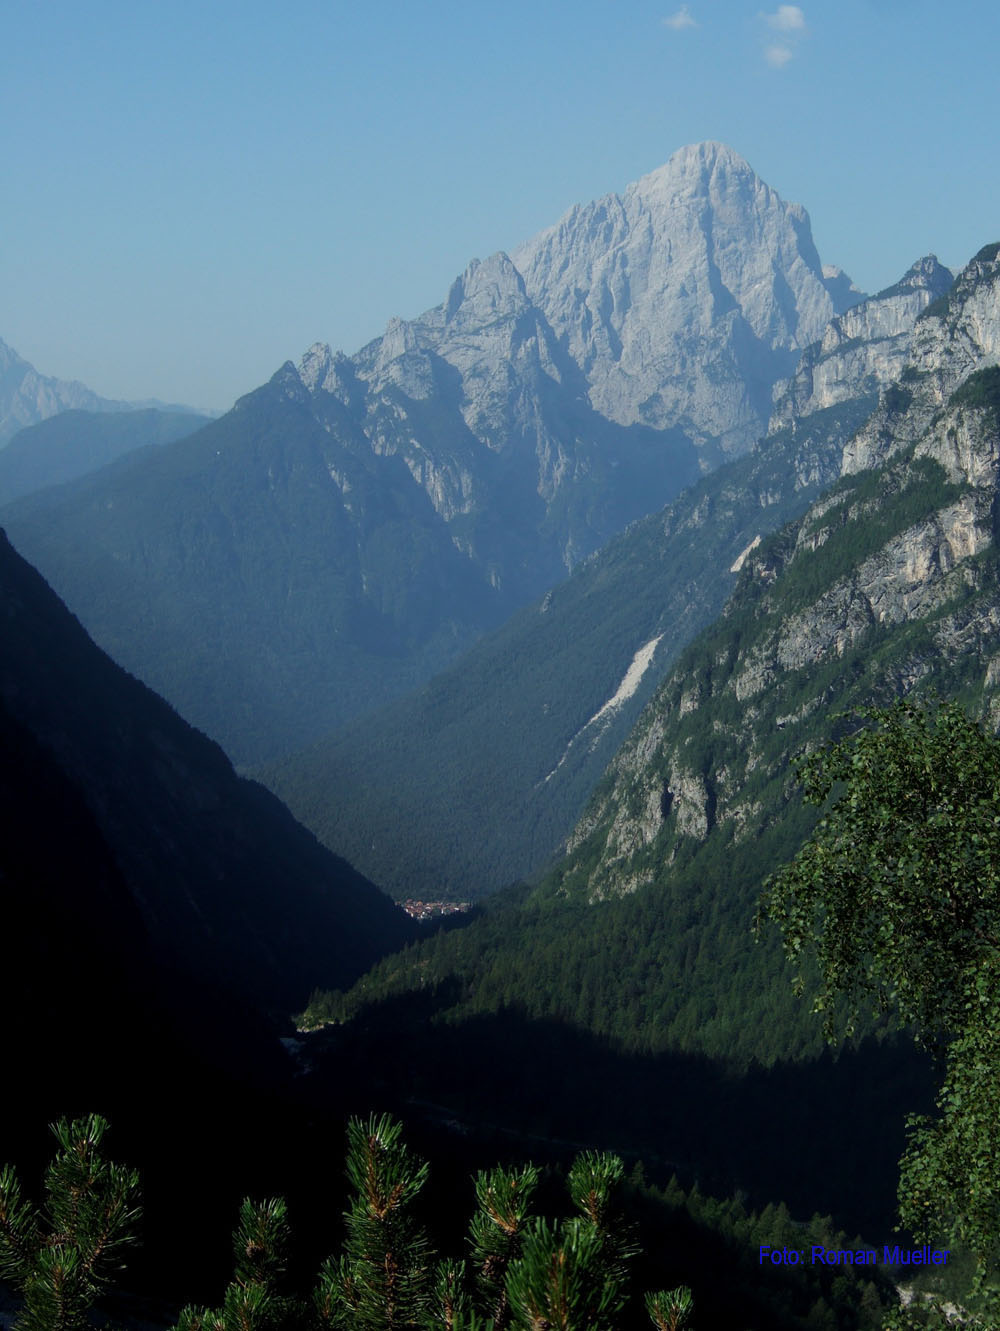 8. Tag: Blick zum Mt. Agner Nordwand